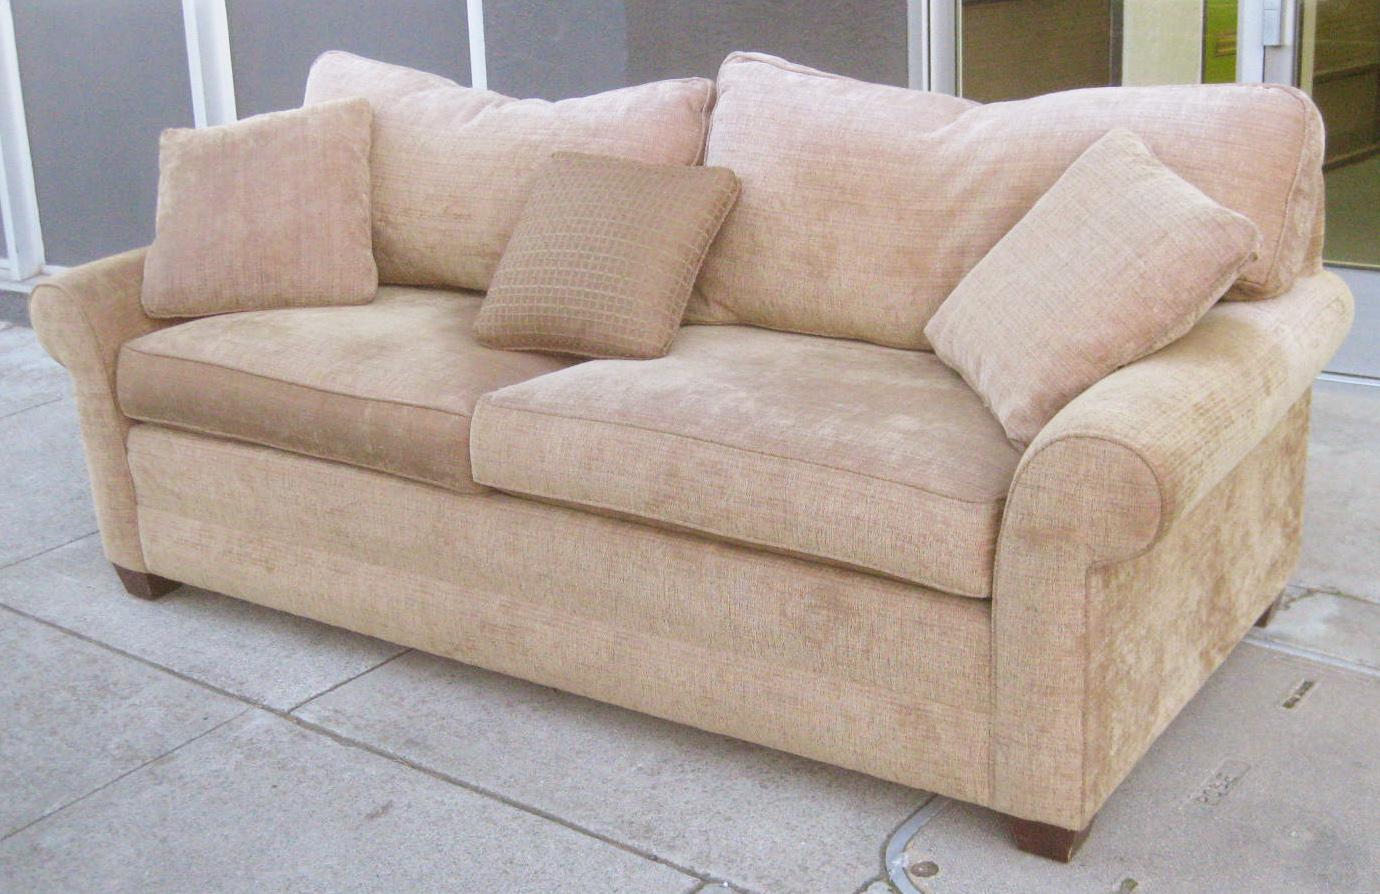 Uhuru Furniture Collectibles Sold Ethan Allen Good Quality Sofa 225